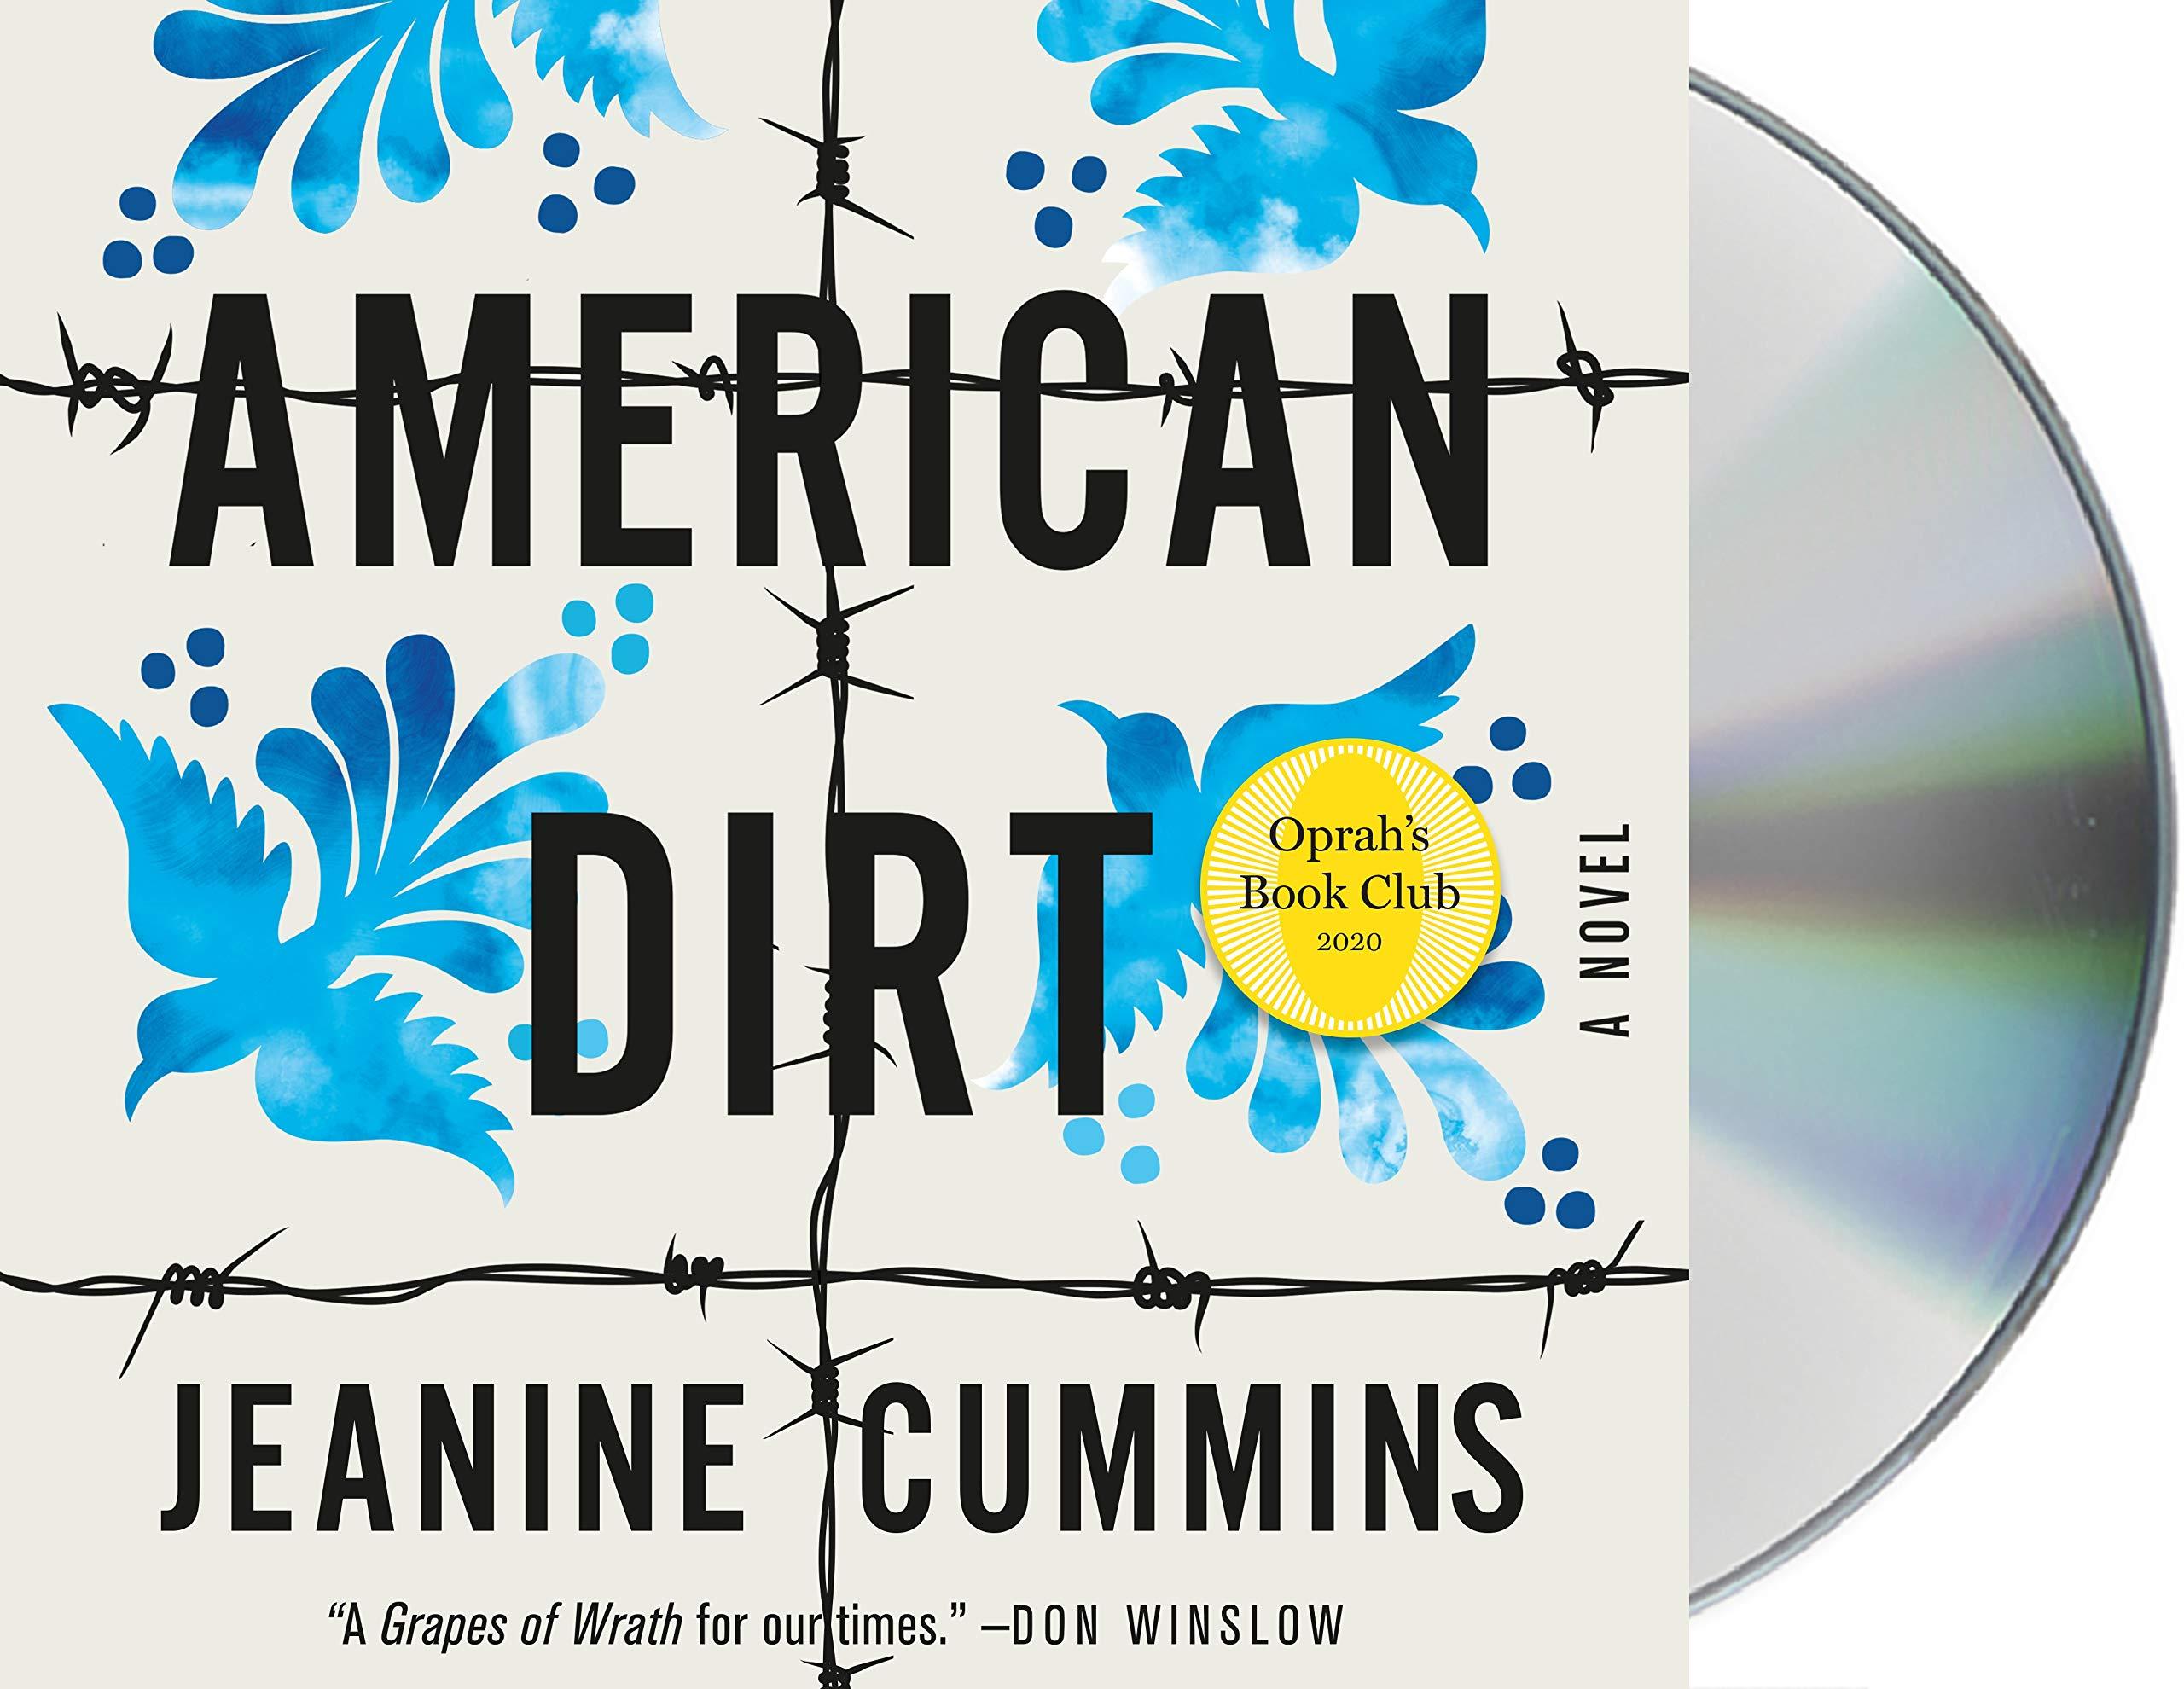 American Dirt Author